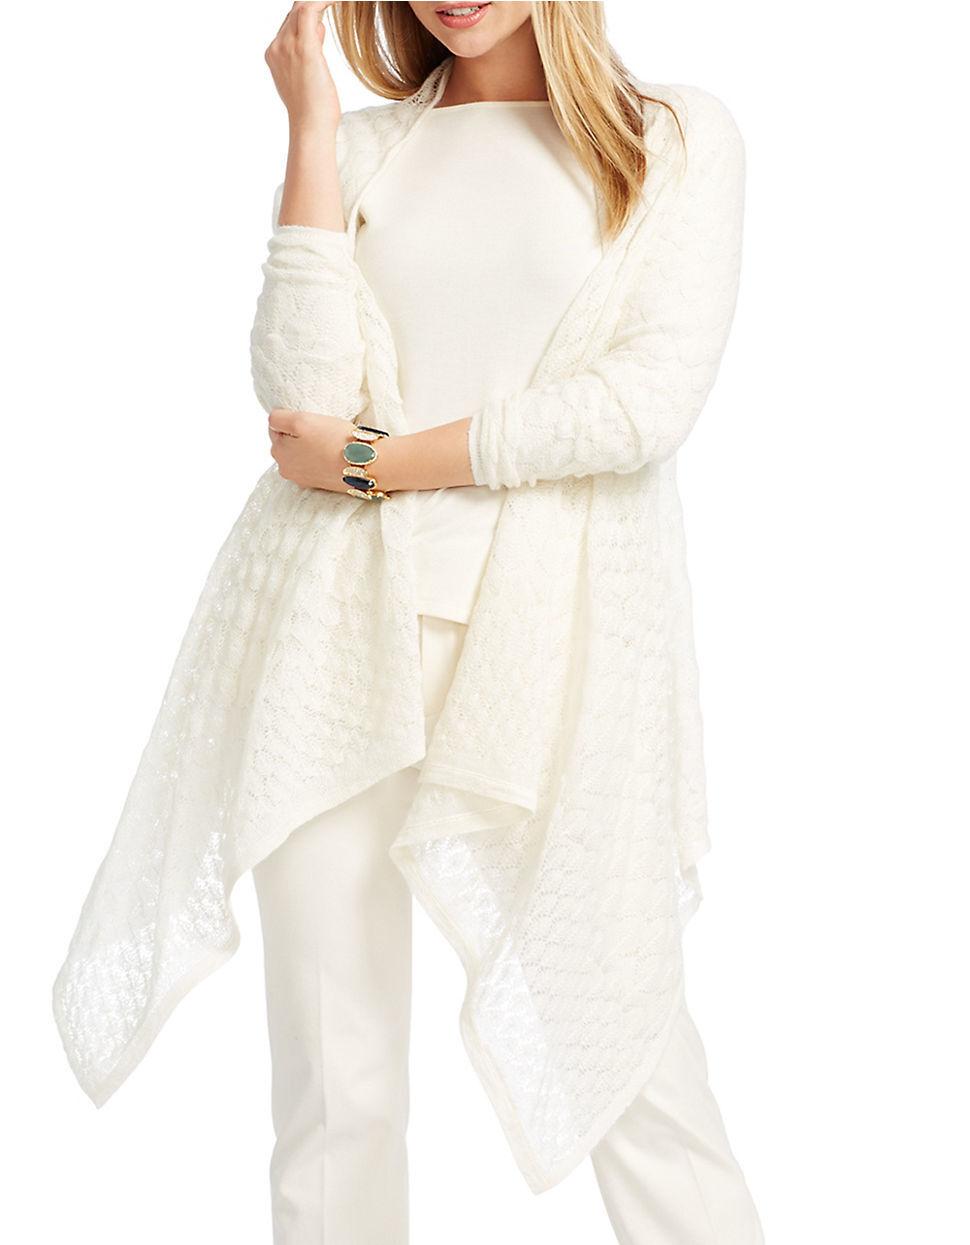 NWT LAUREN RALPH LAUREN Women's  Pointelle Bubble-knit Cardigan Sz PXS S